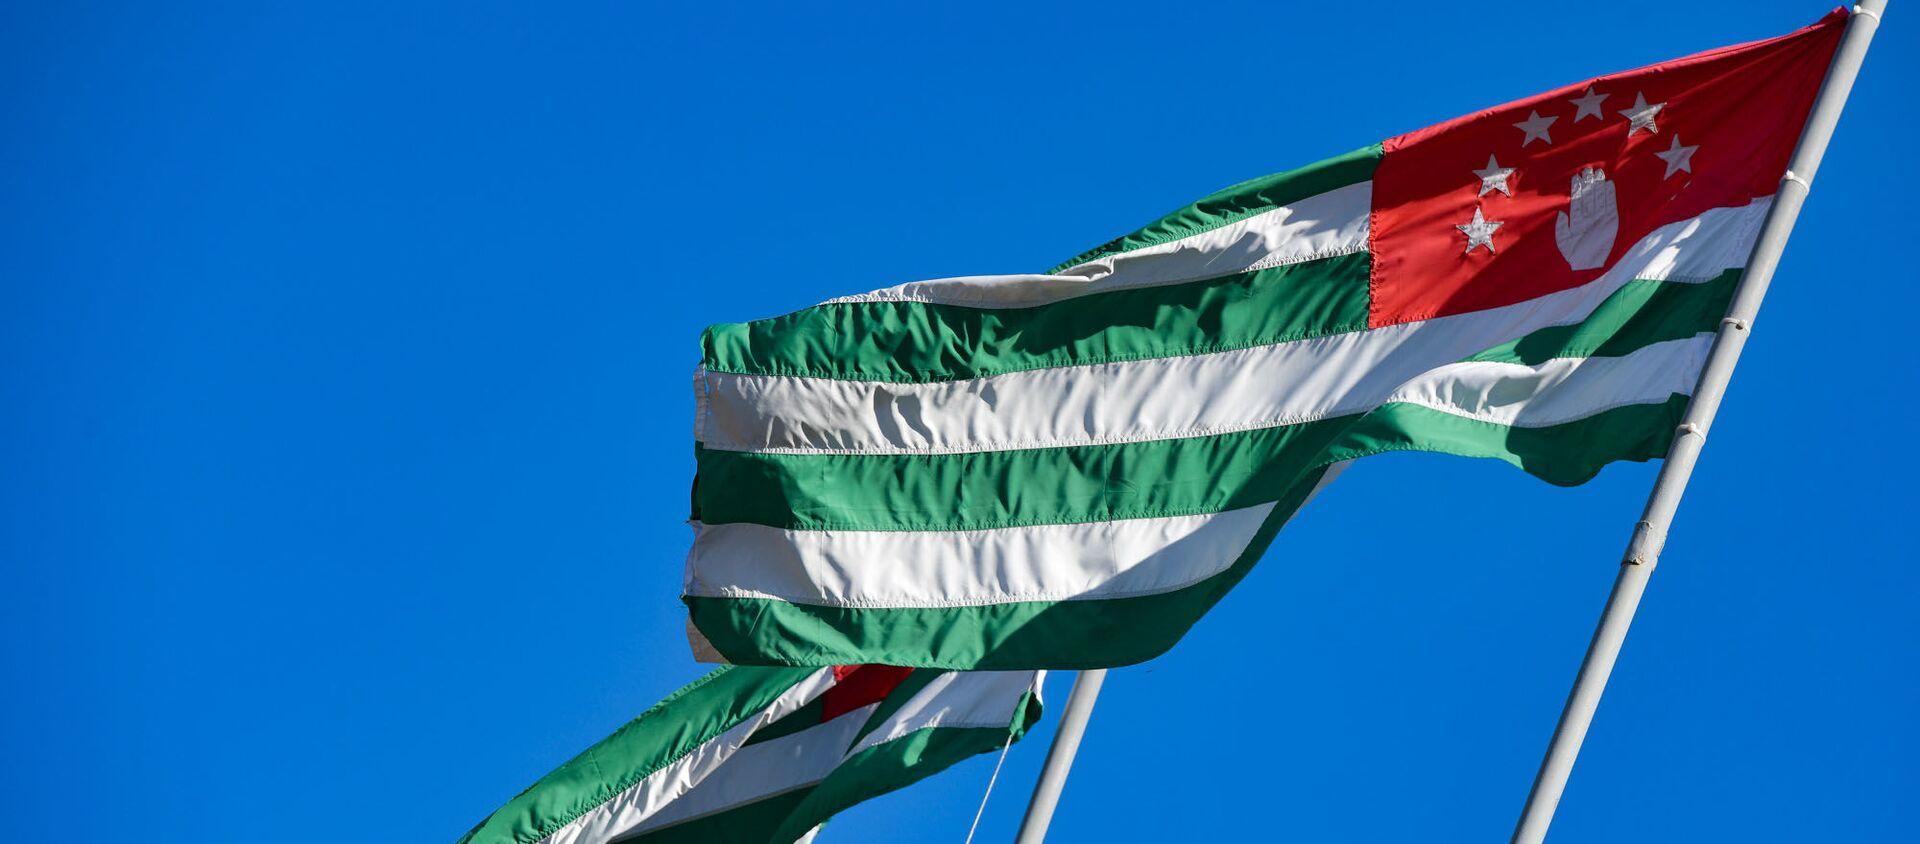 Абхазский флаг - Sputnik Абхазия, 1920, 23.07.2021